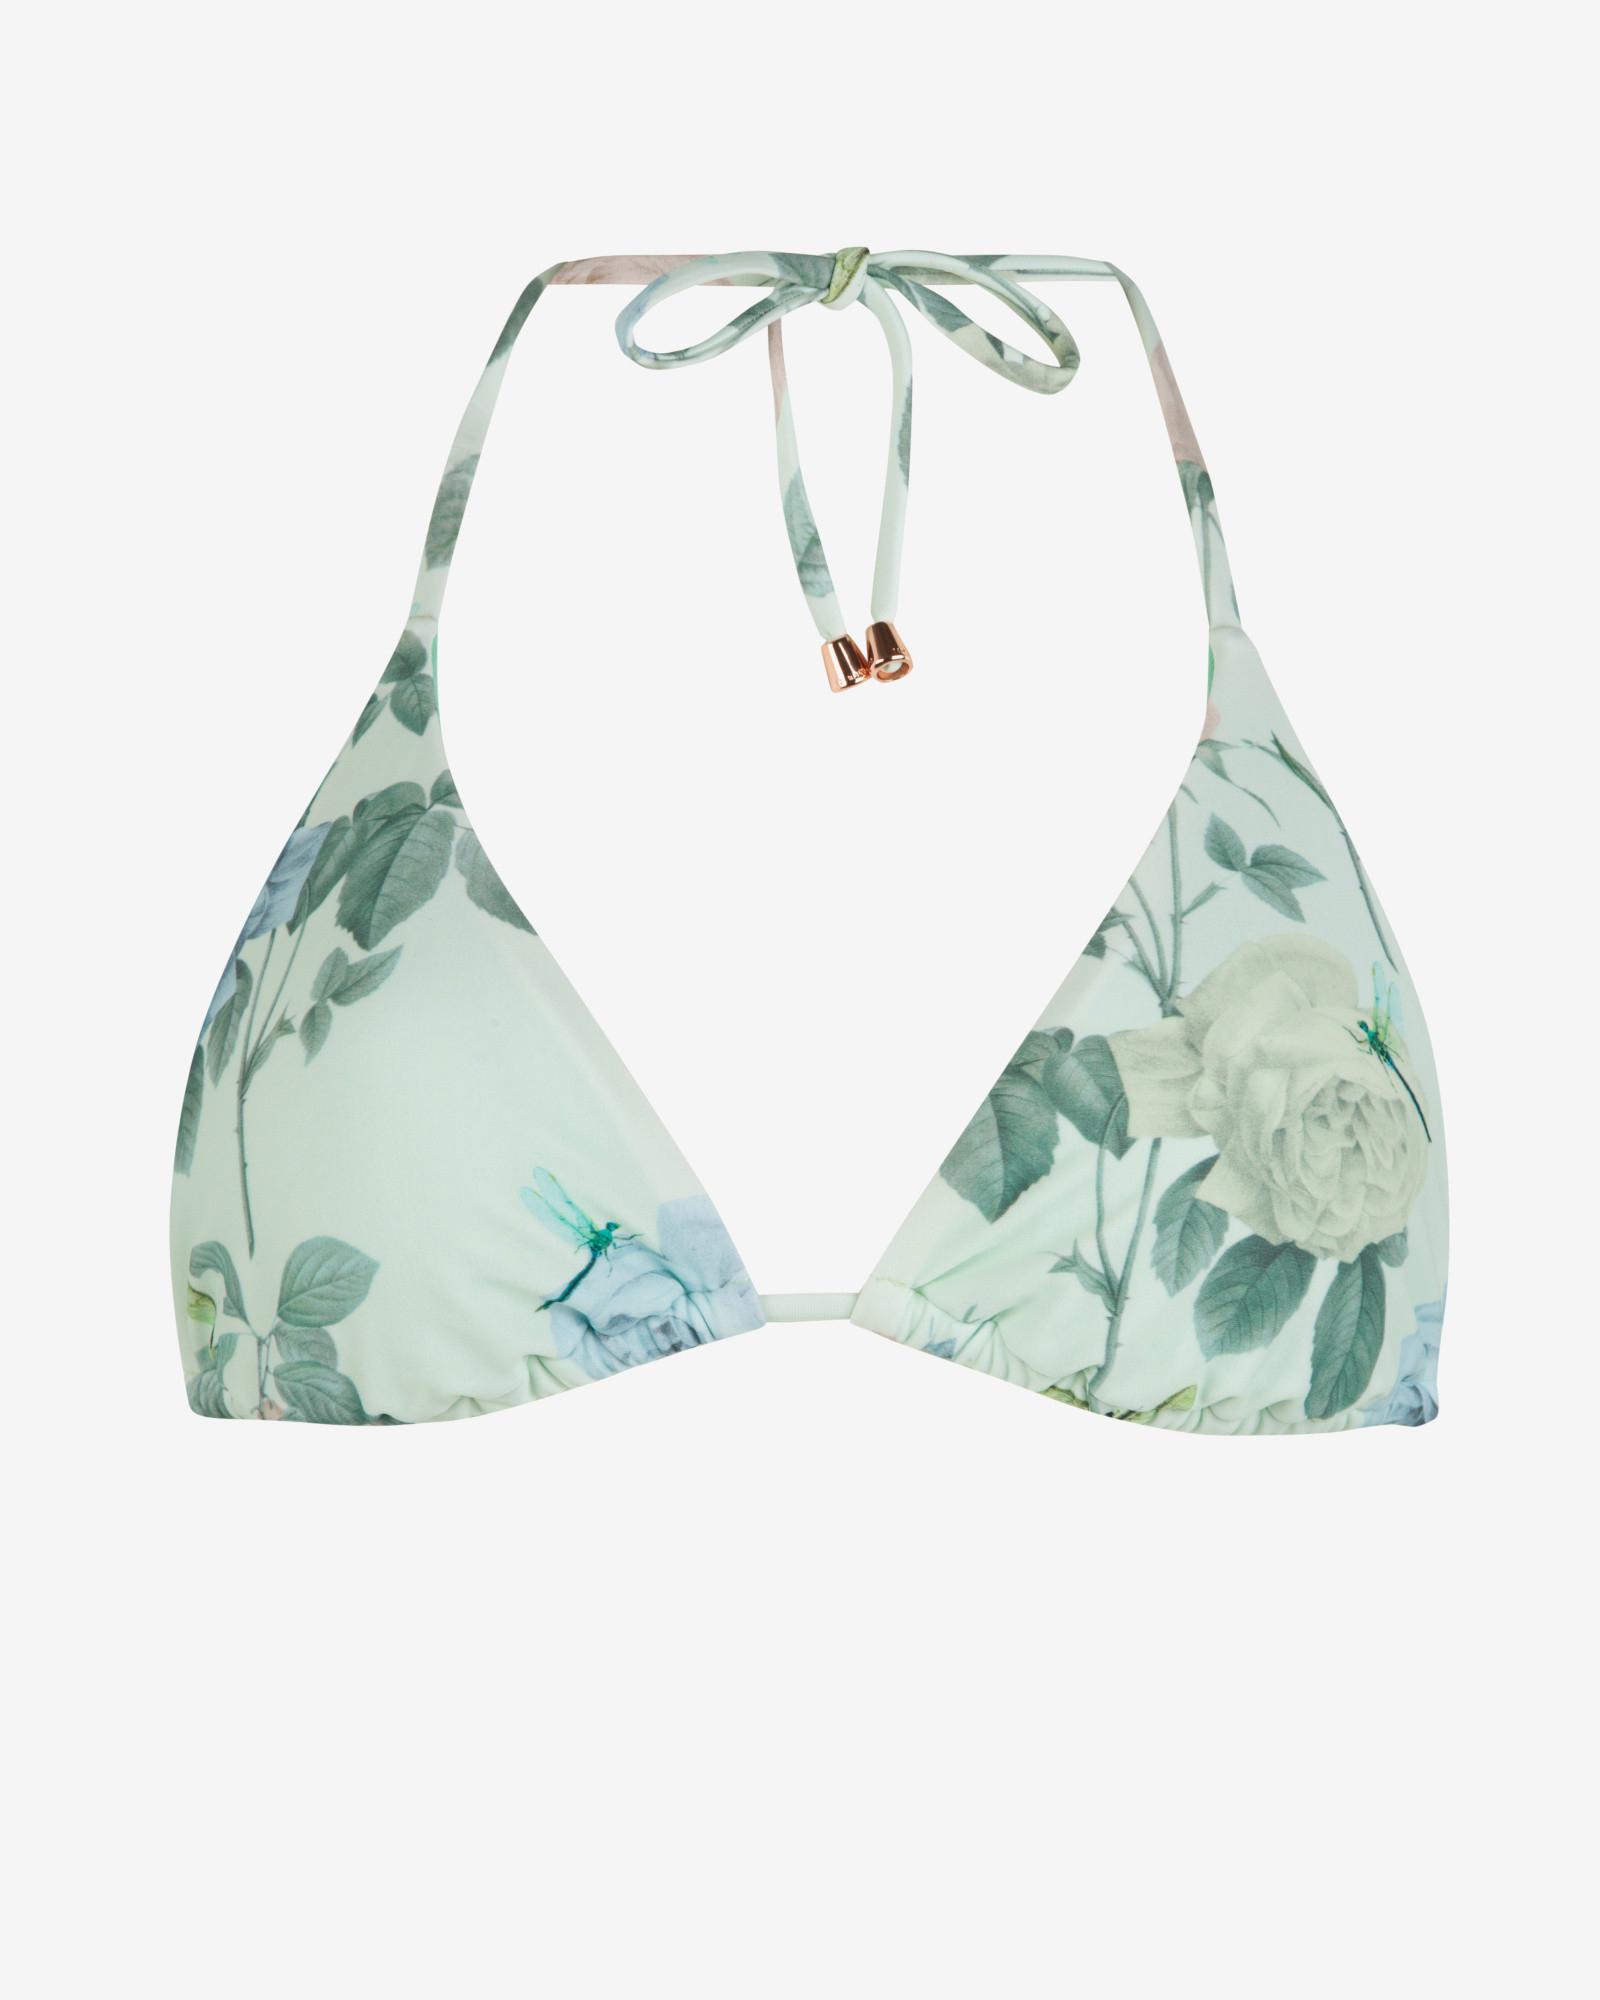 be334fd361 Lyst - Ted Baker Distinguishing Rose Triangle Bikini Top in Green